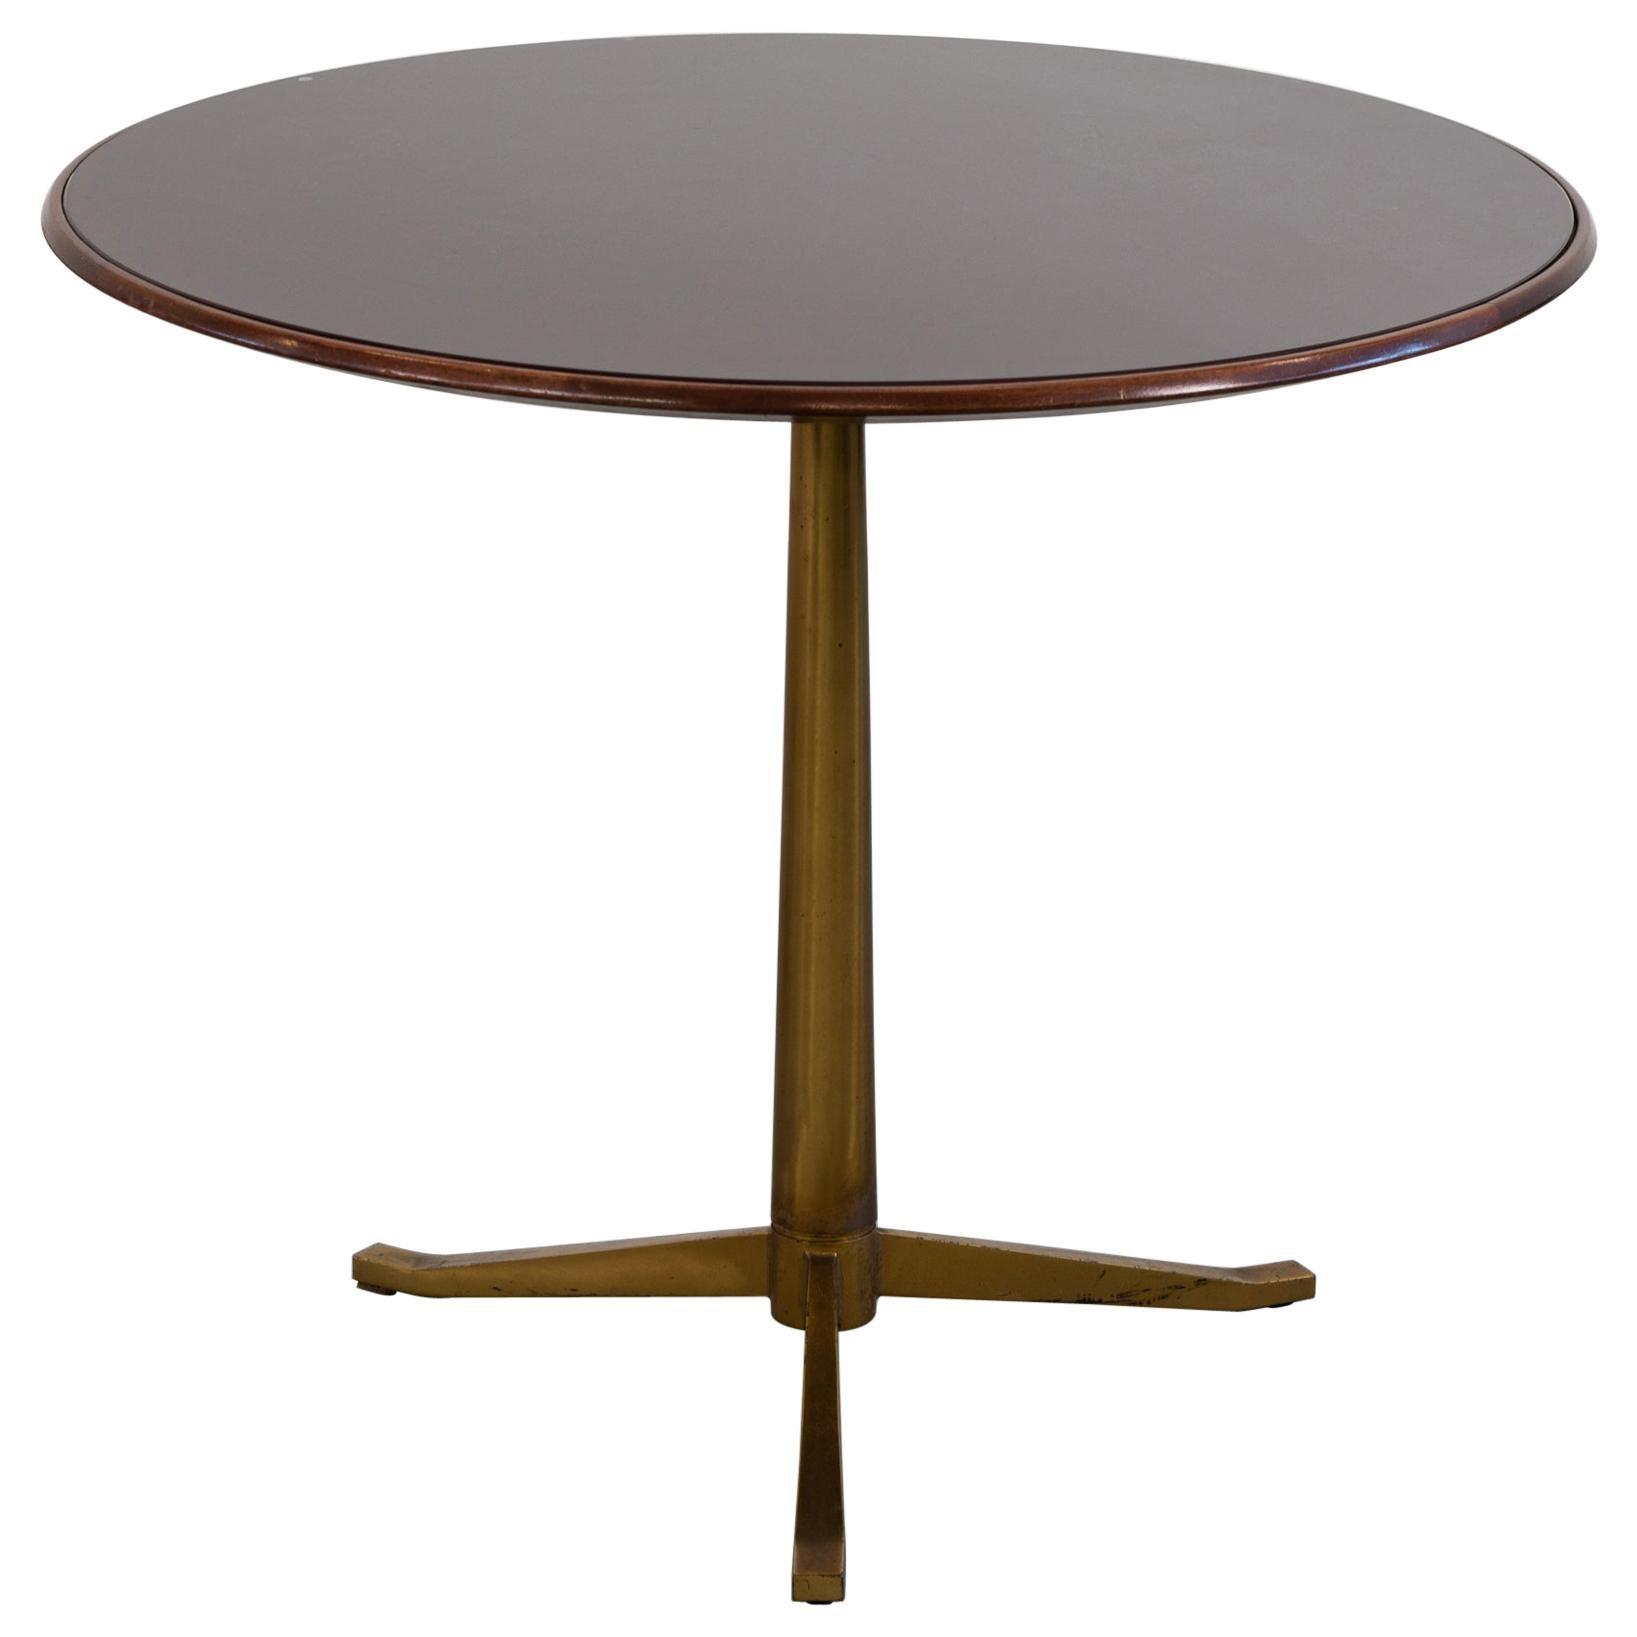 Osvaldo Borsani Coffee Table in Walnut and Crystal Borsani Varedo Production